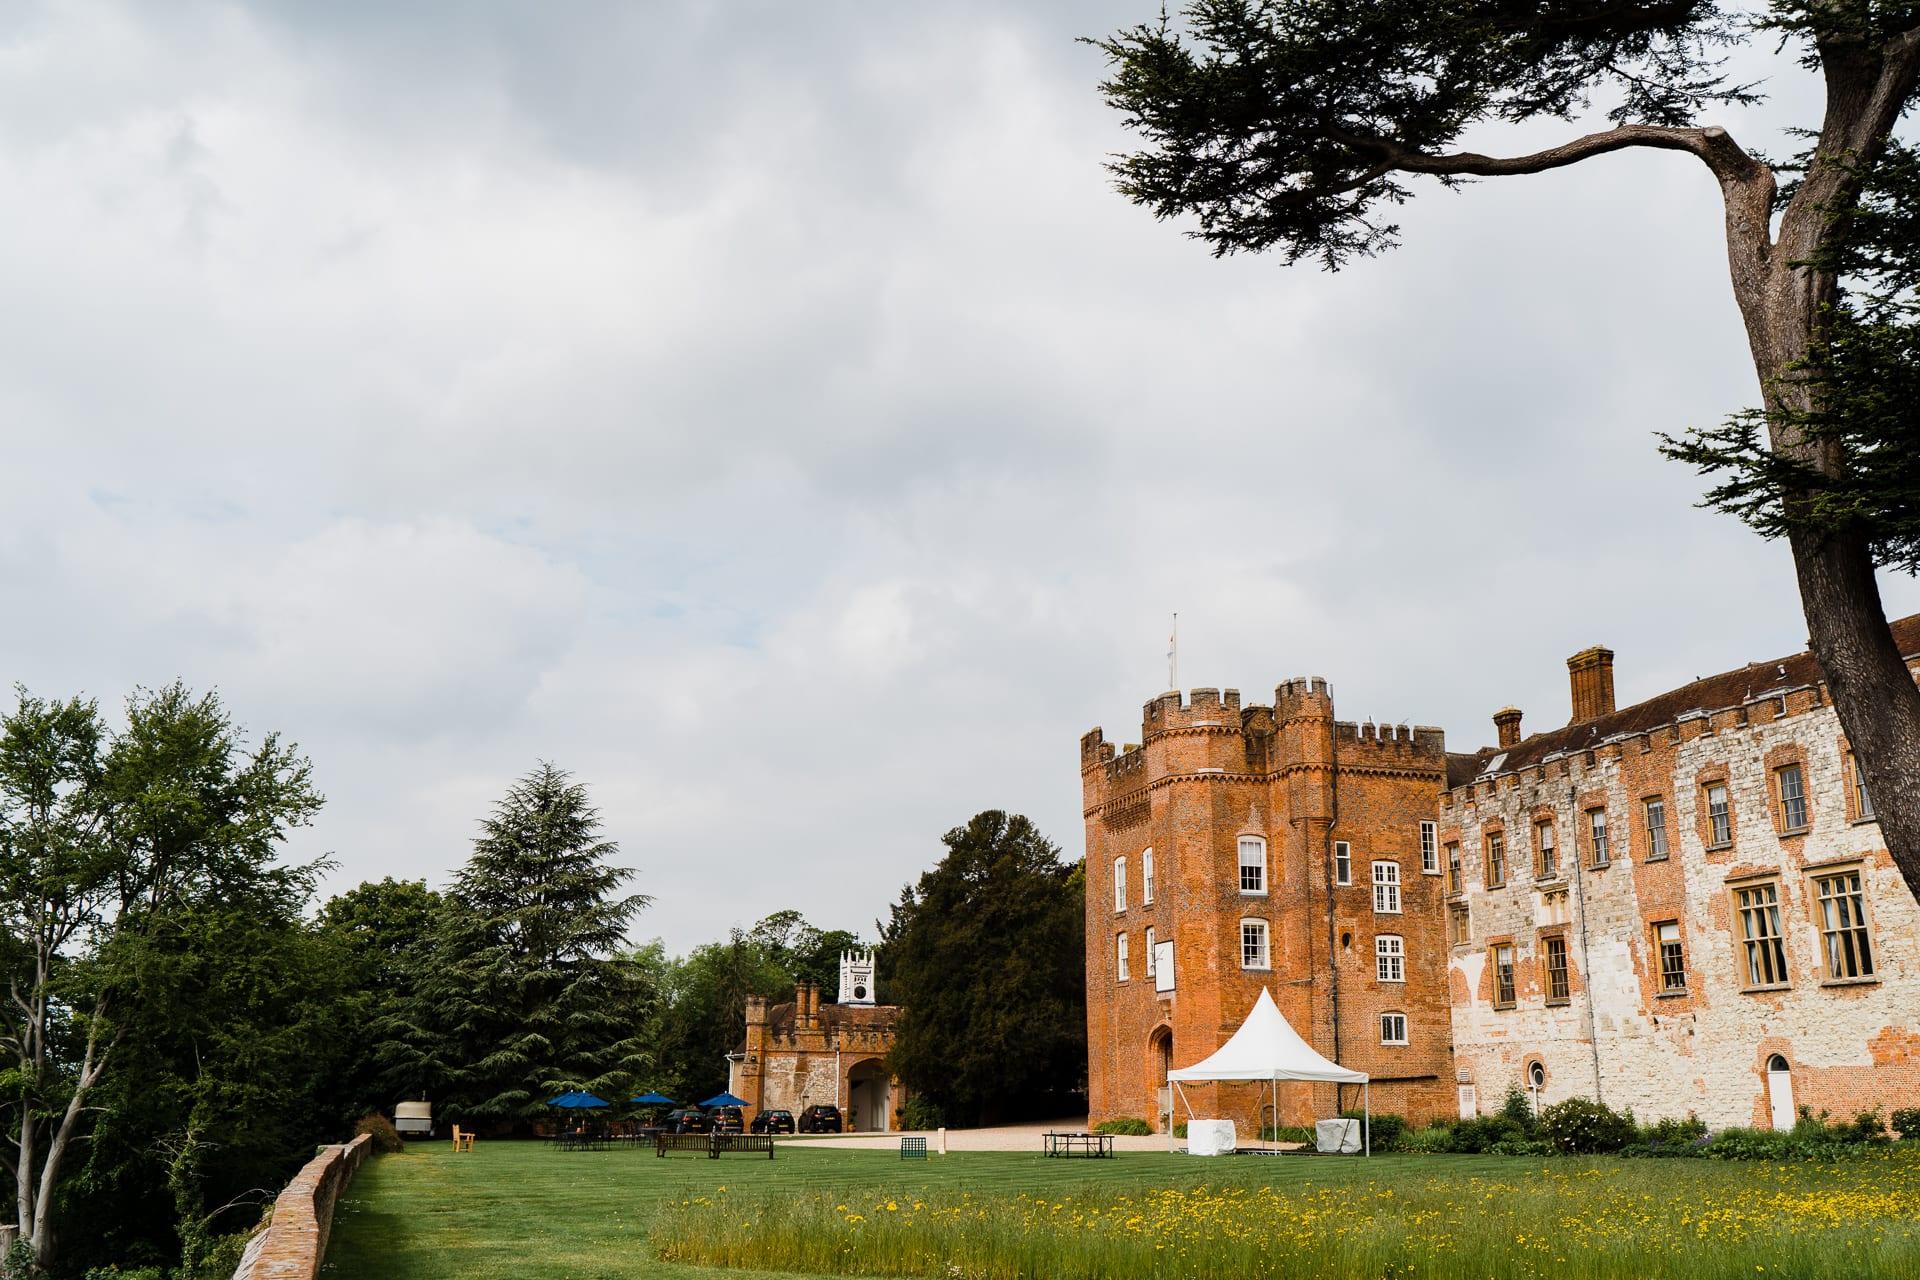 Farnham Castle is one of Surrey's Castle wedding venues